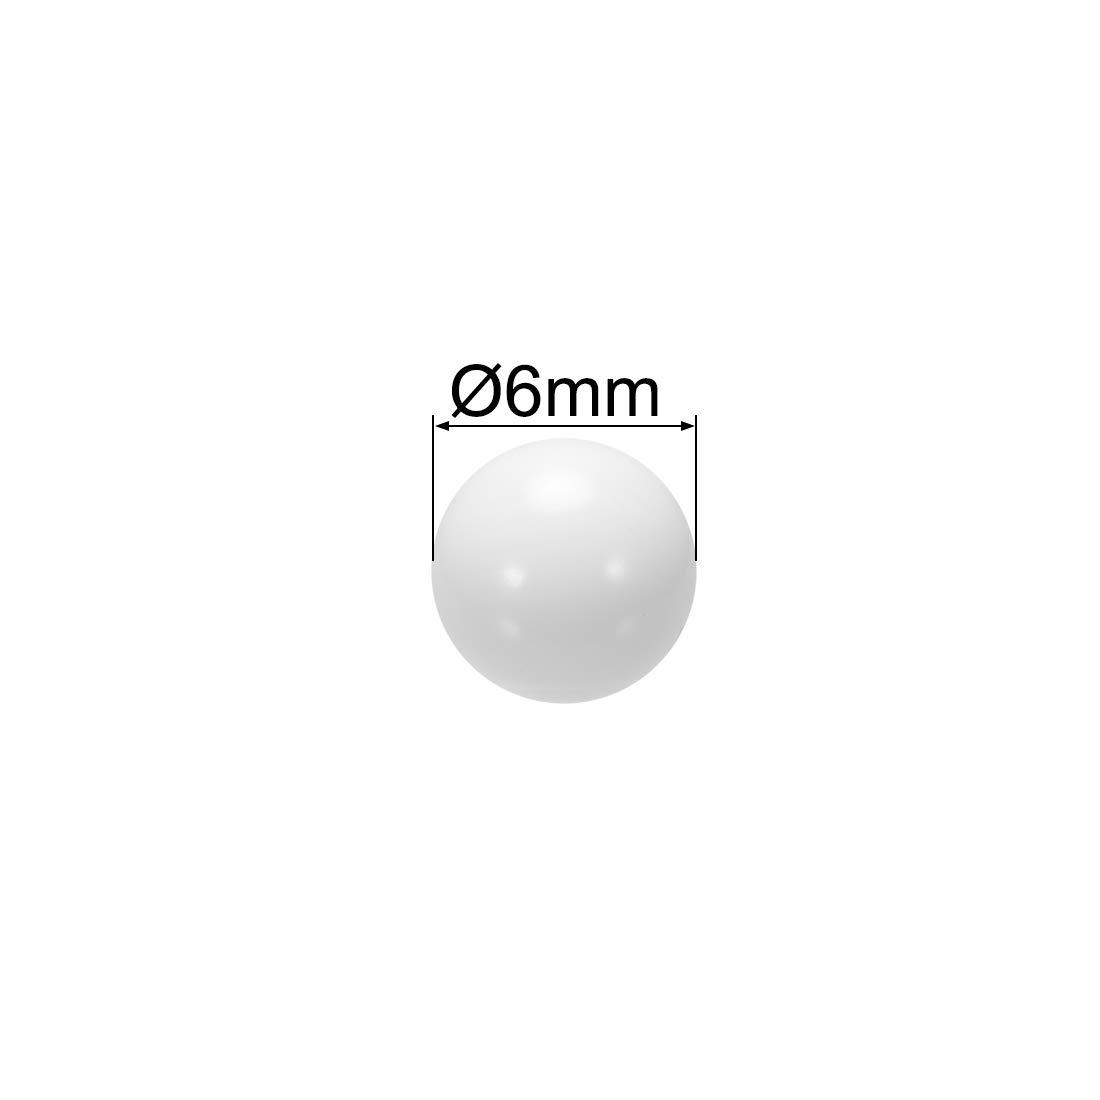 sourcing map 4.5mm POM Coin Ring Making Balls Plastic Bearing Ball 100pcs